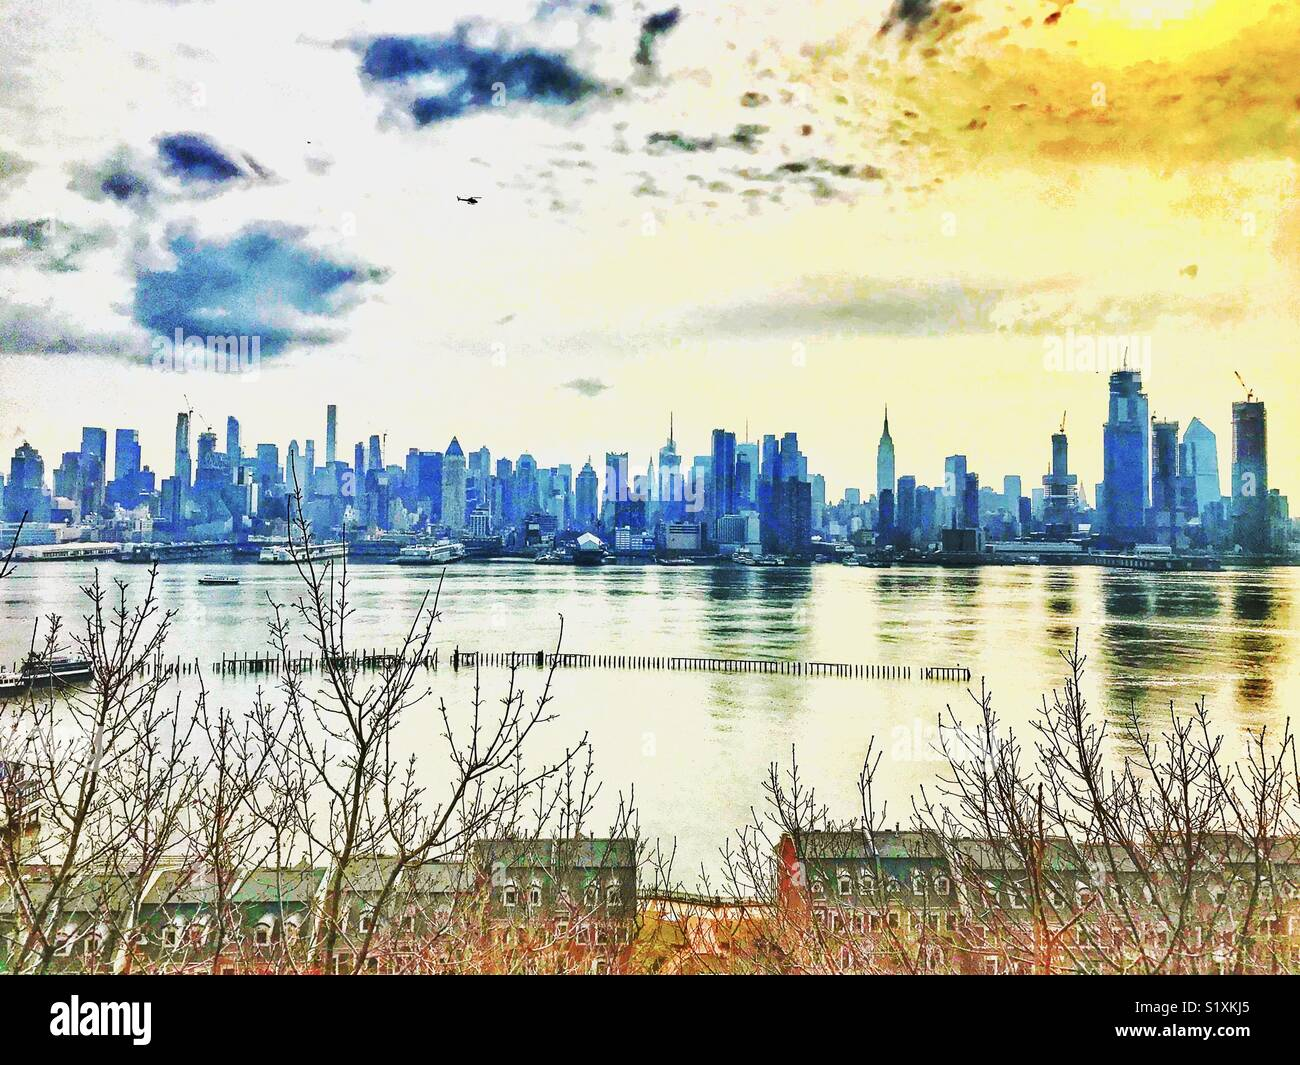 New York City skylines - Stock Image